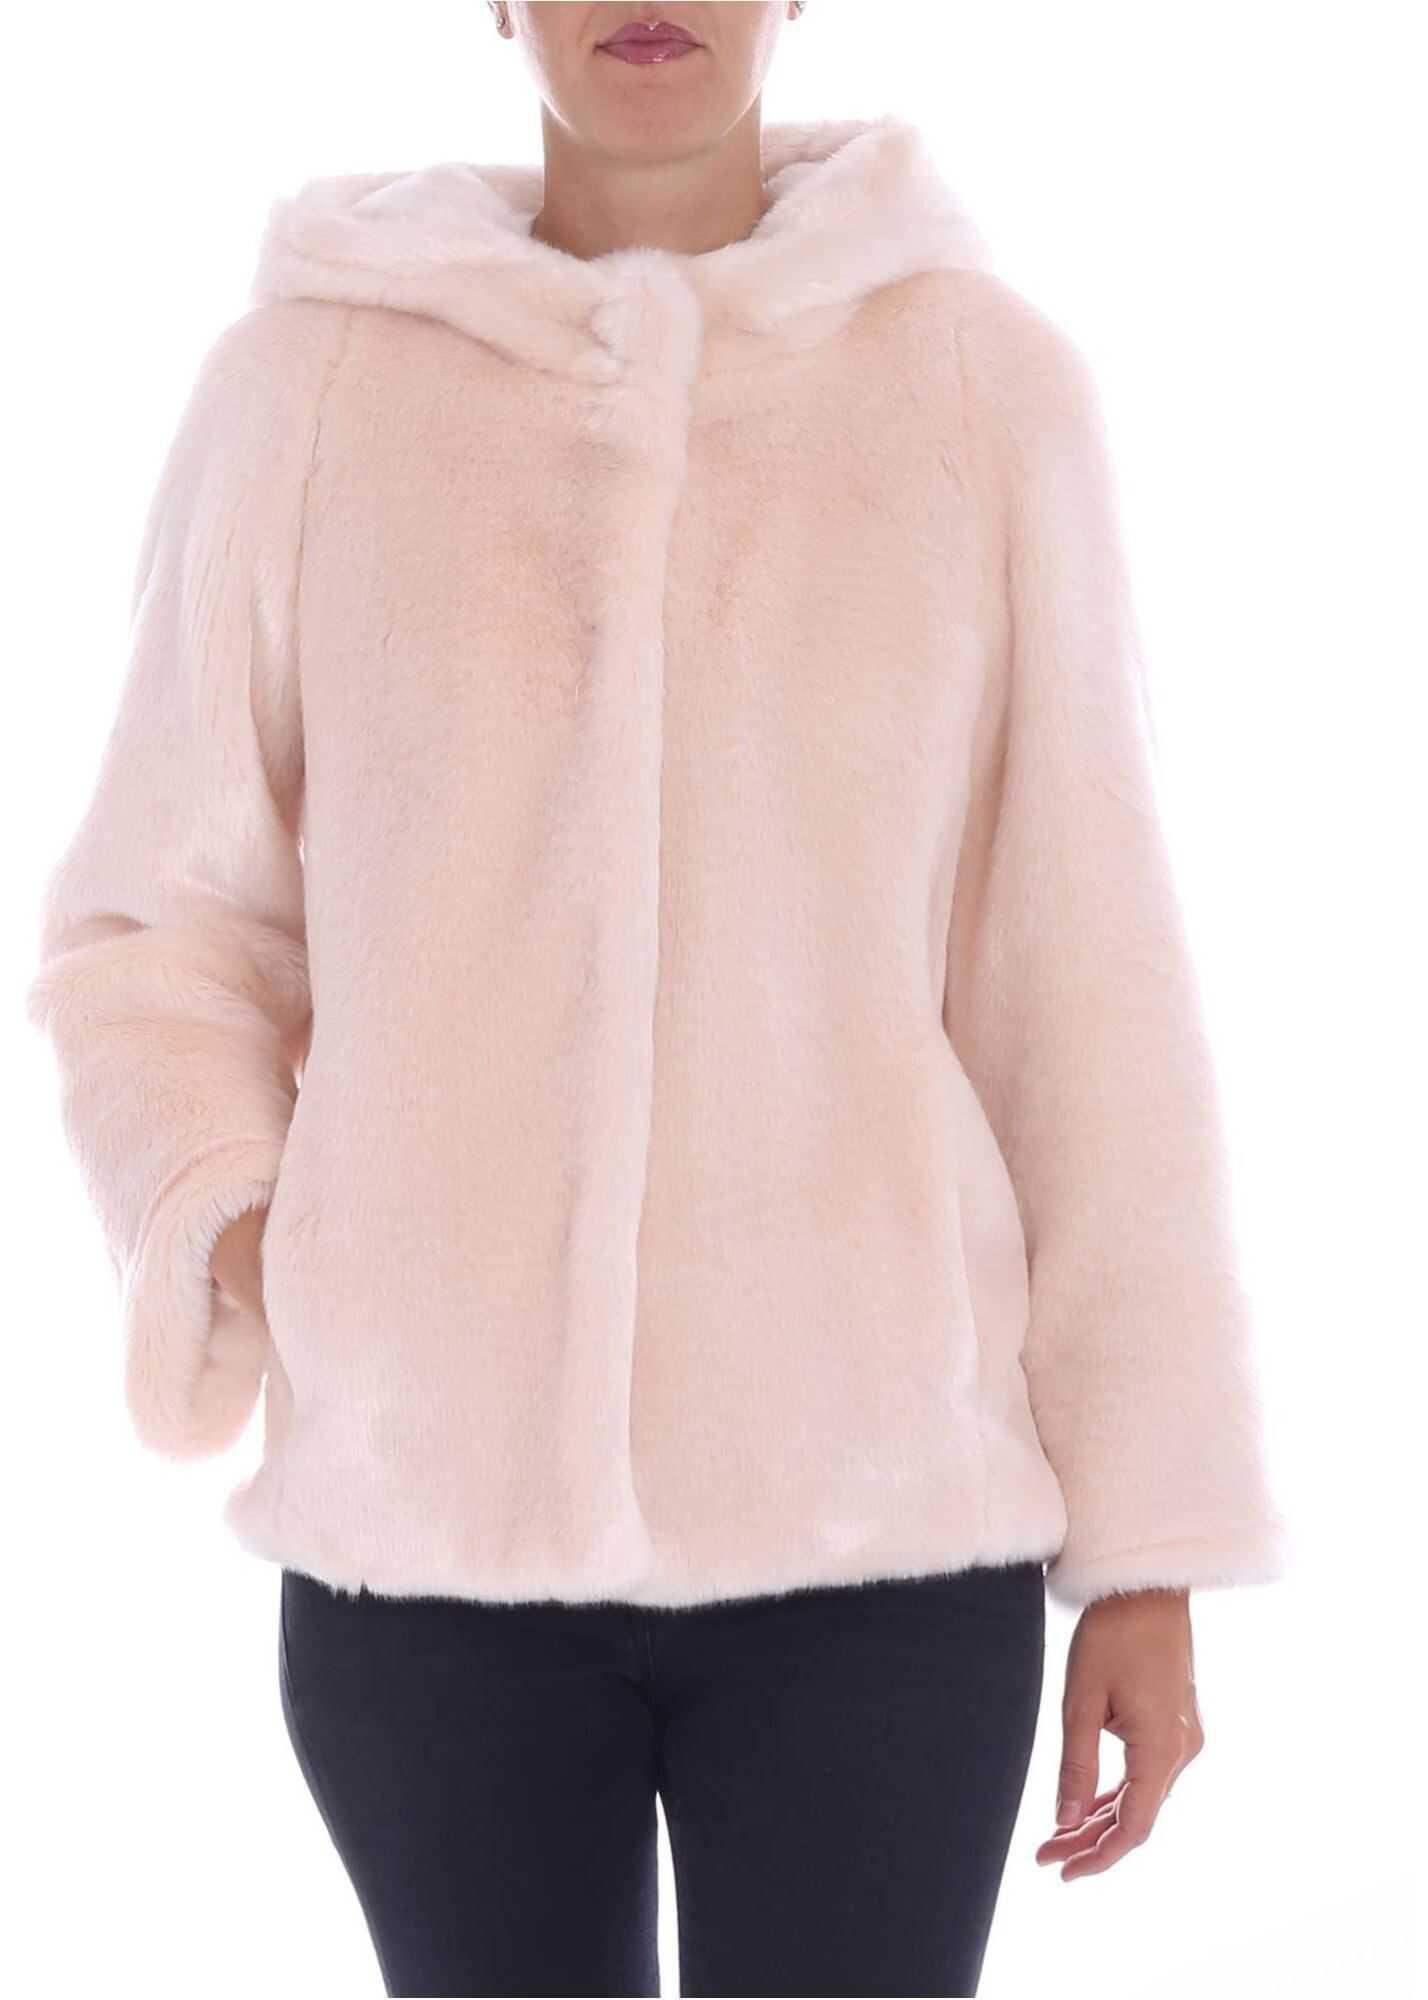 Tagliatore Pink Hooded Eco-Fur Jacket Pink